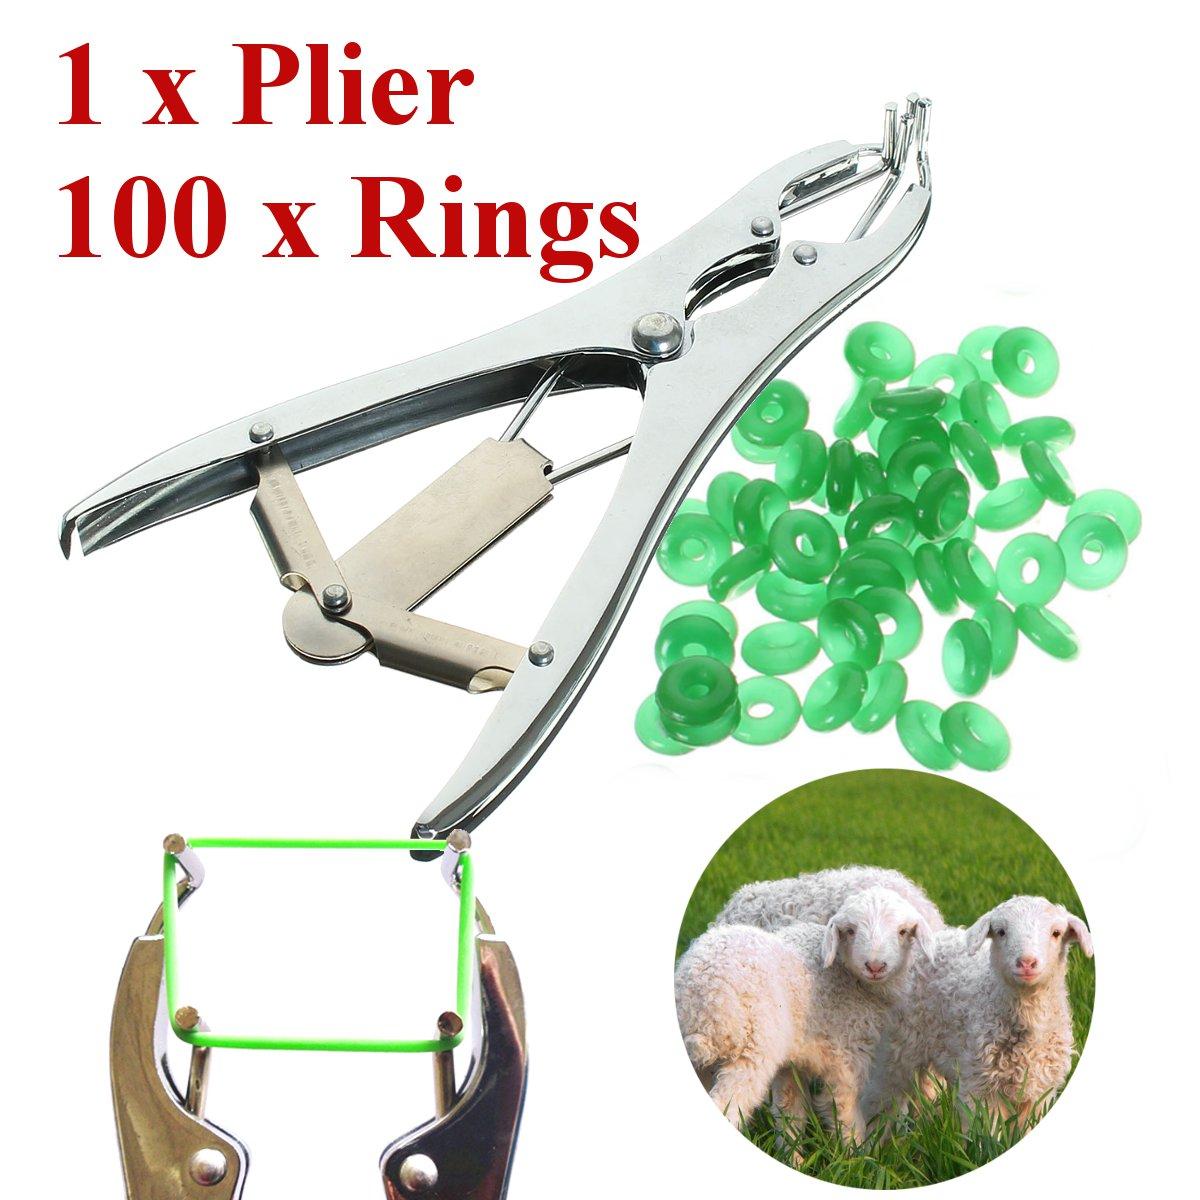 1 Plier for Sheep Cattle Castration Banding Tail Applicator Farm w/ 100 Rings Щипцы